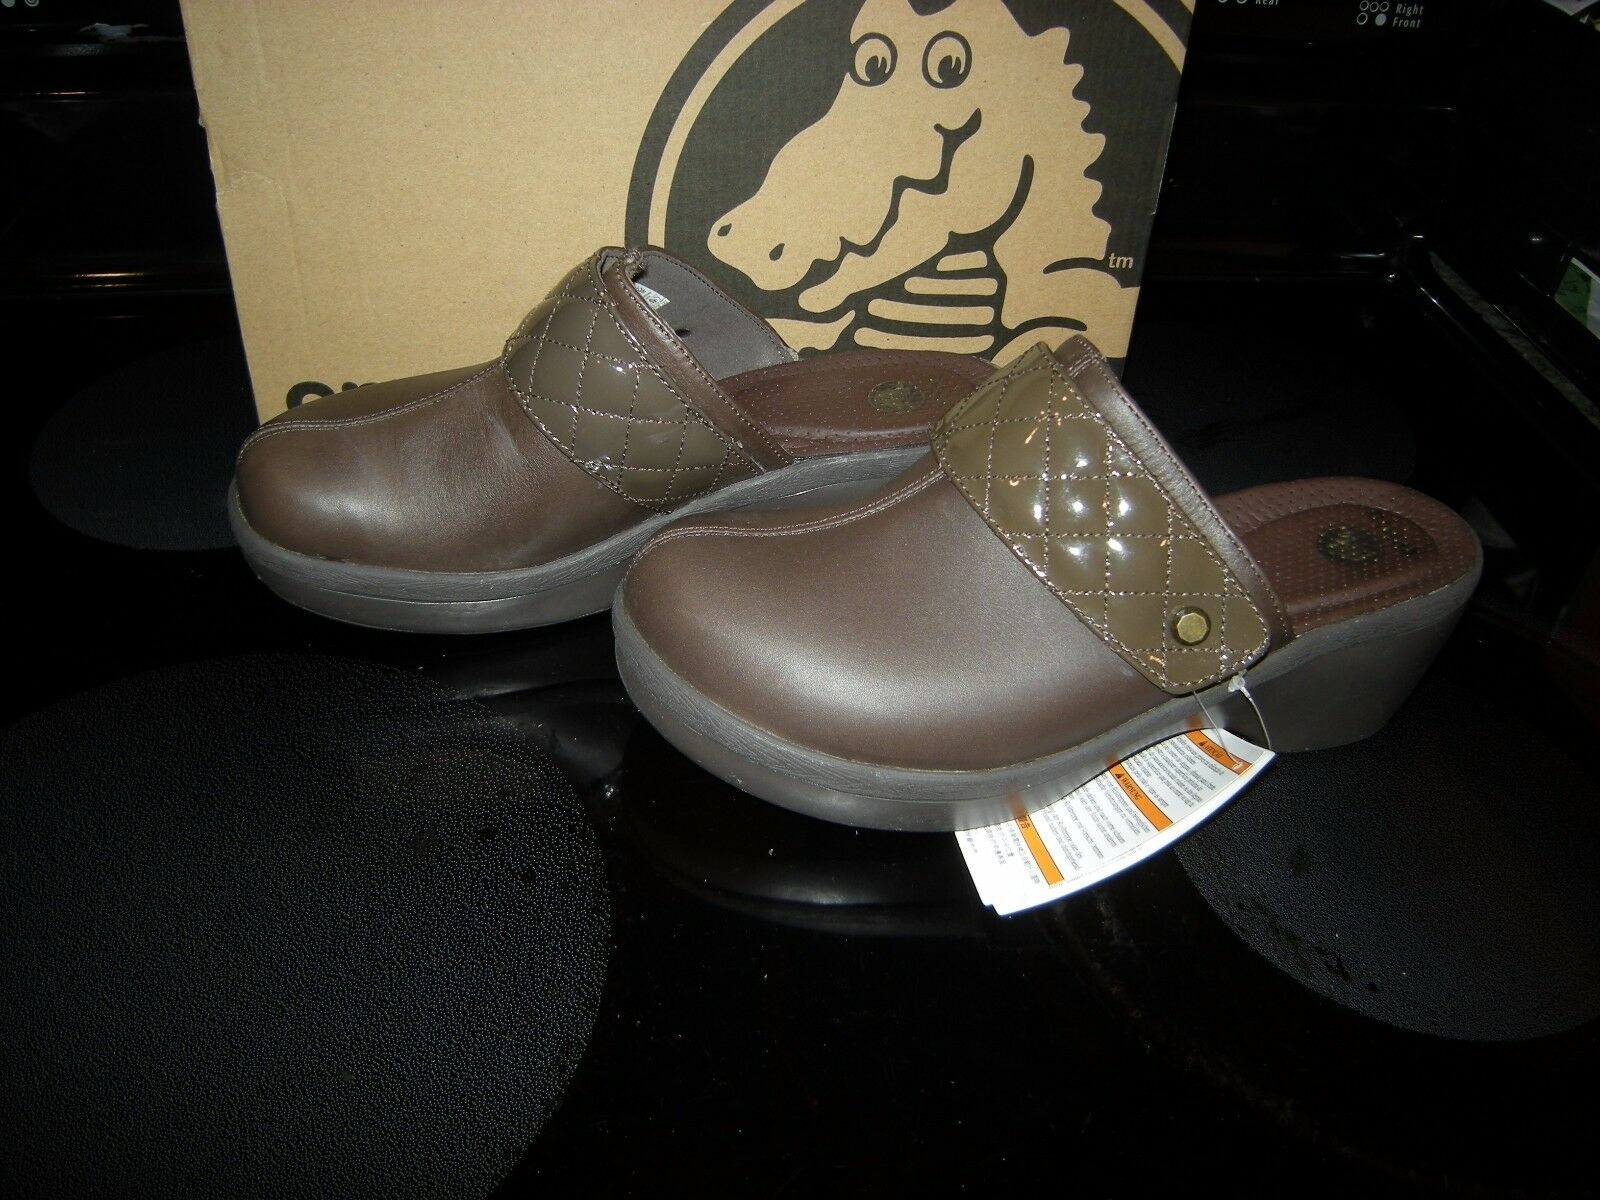 Brand New Womens Brown Crocs Cobbler Quilt Strap Slide On Shoes, Size 6